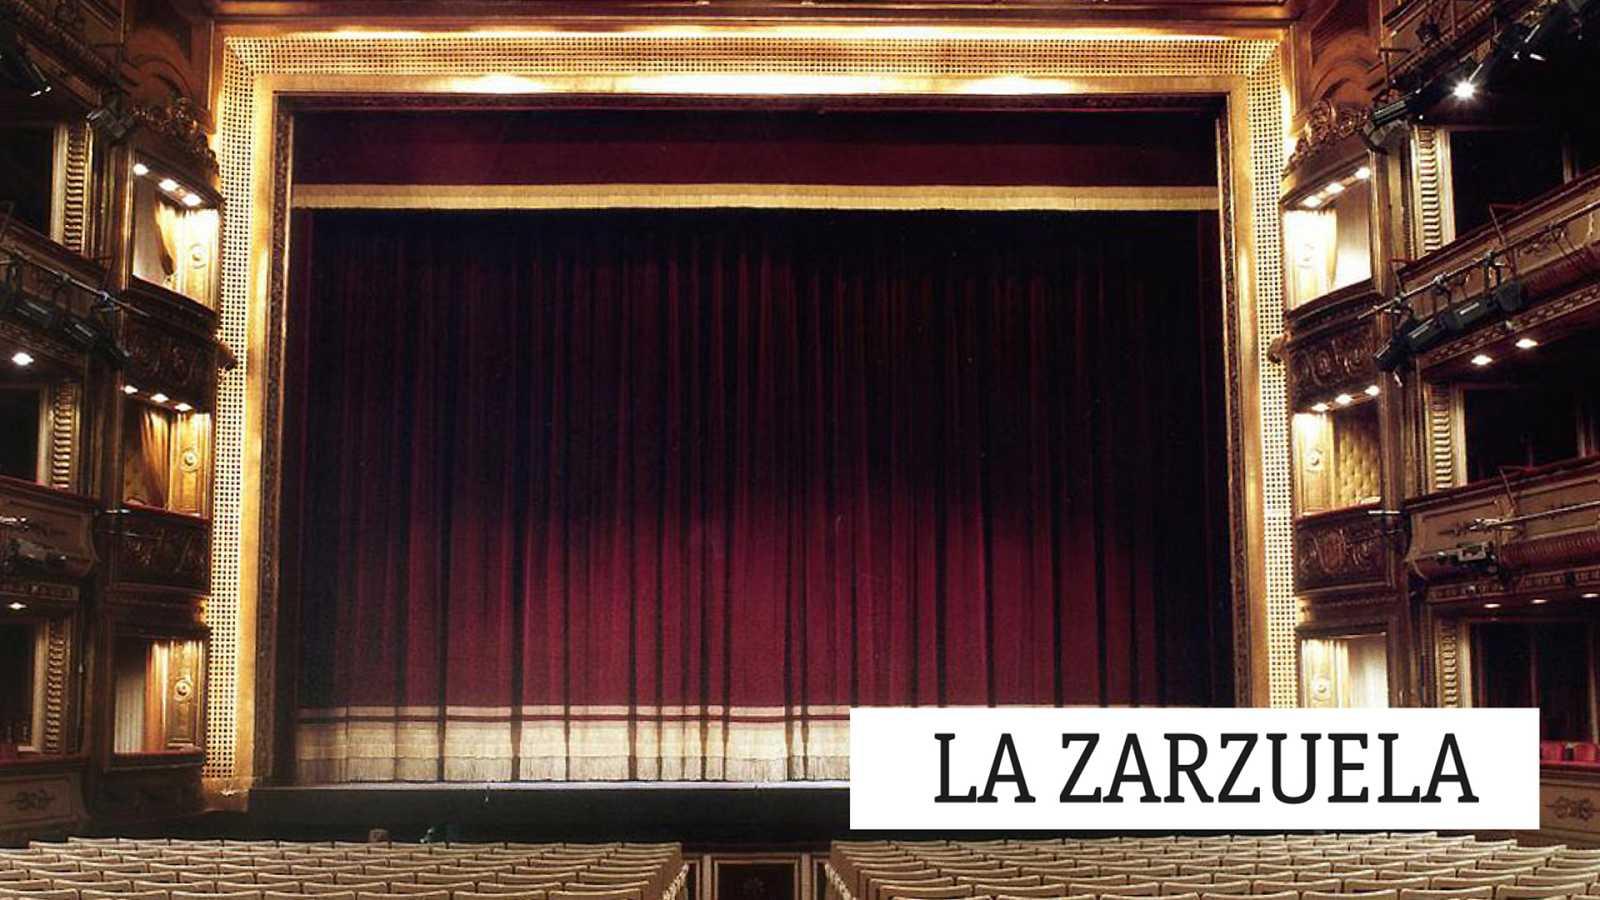 La zarzuela - Jerónimo Vilardell - 10/02/21 - escuchar ahora